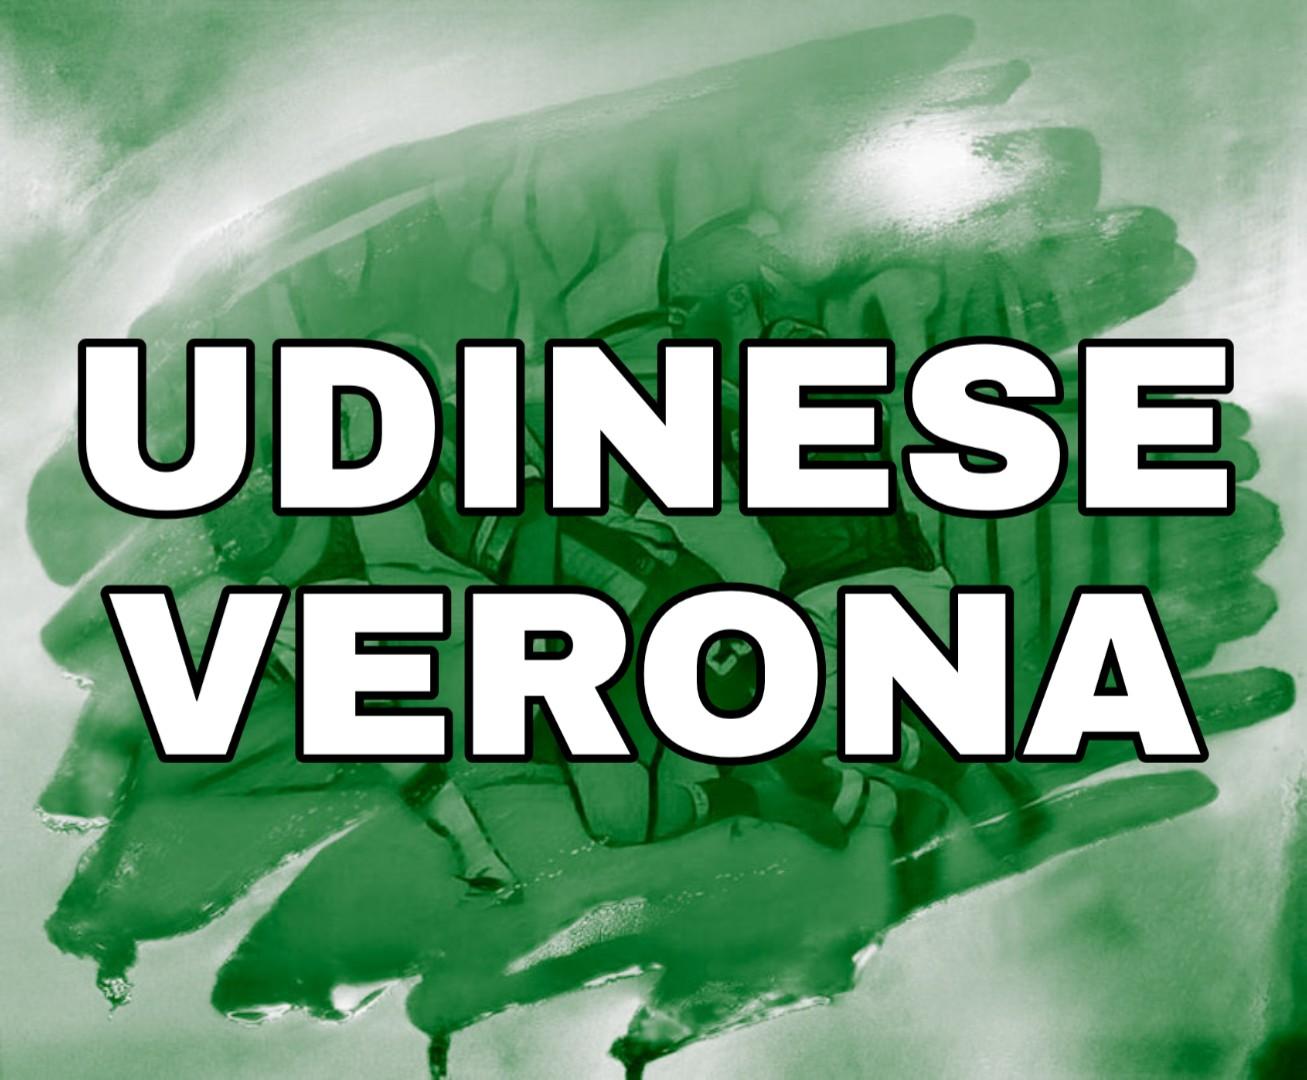 Udinese Verona fantacalcio